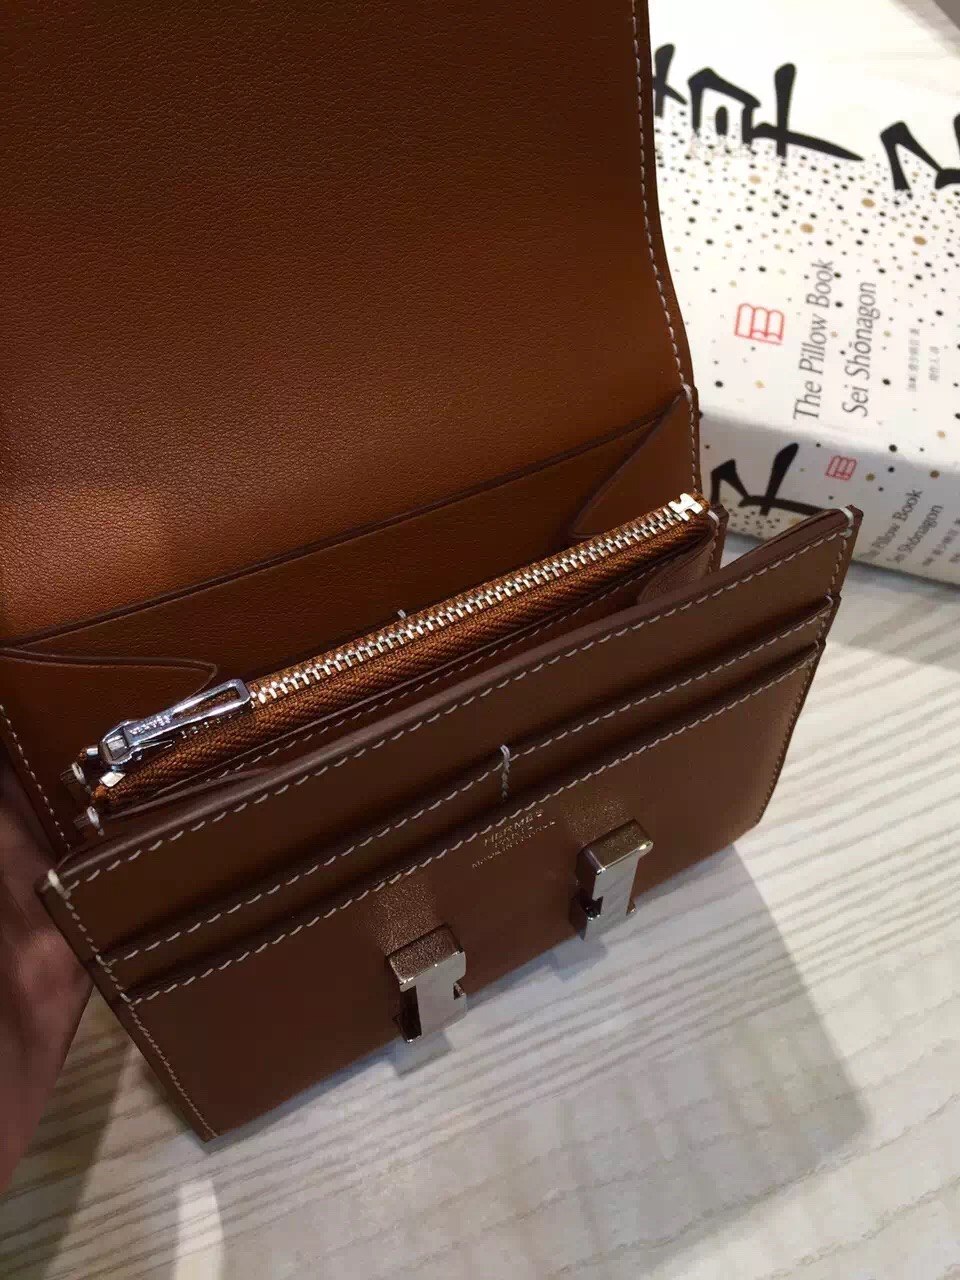 Hermes Custom-made Short Constance Wallet 2H Camel Color Swift Leather